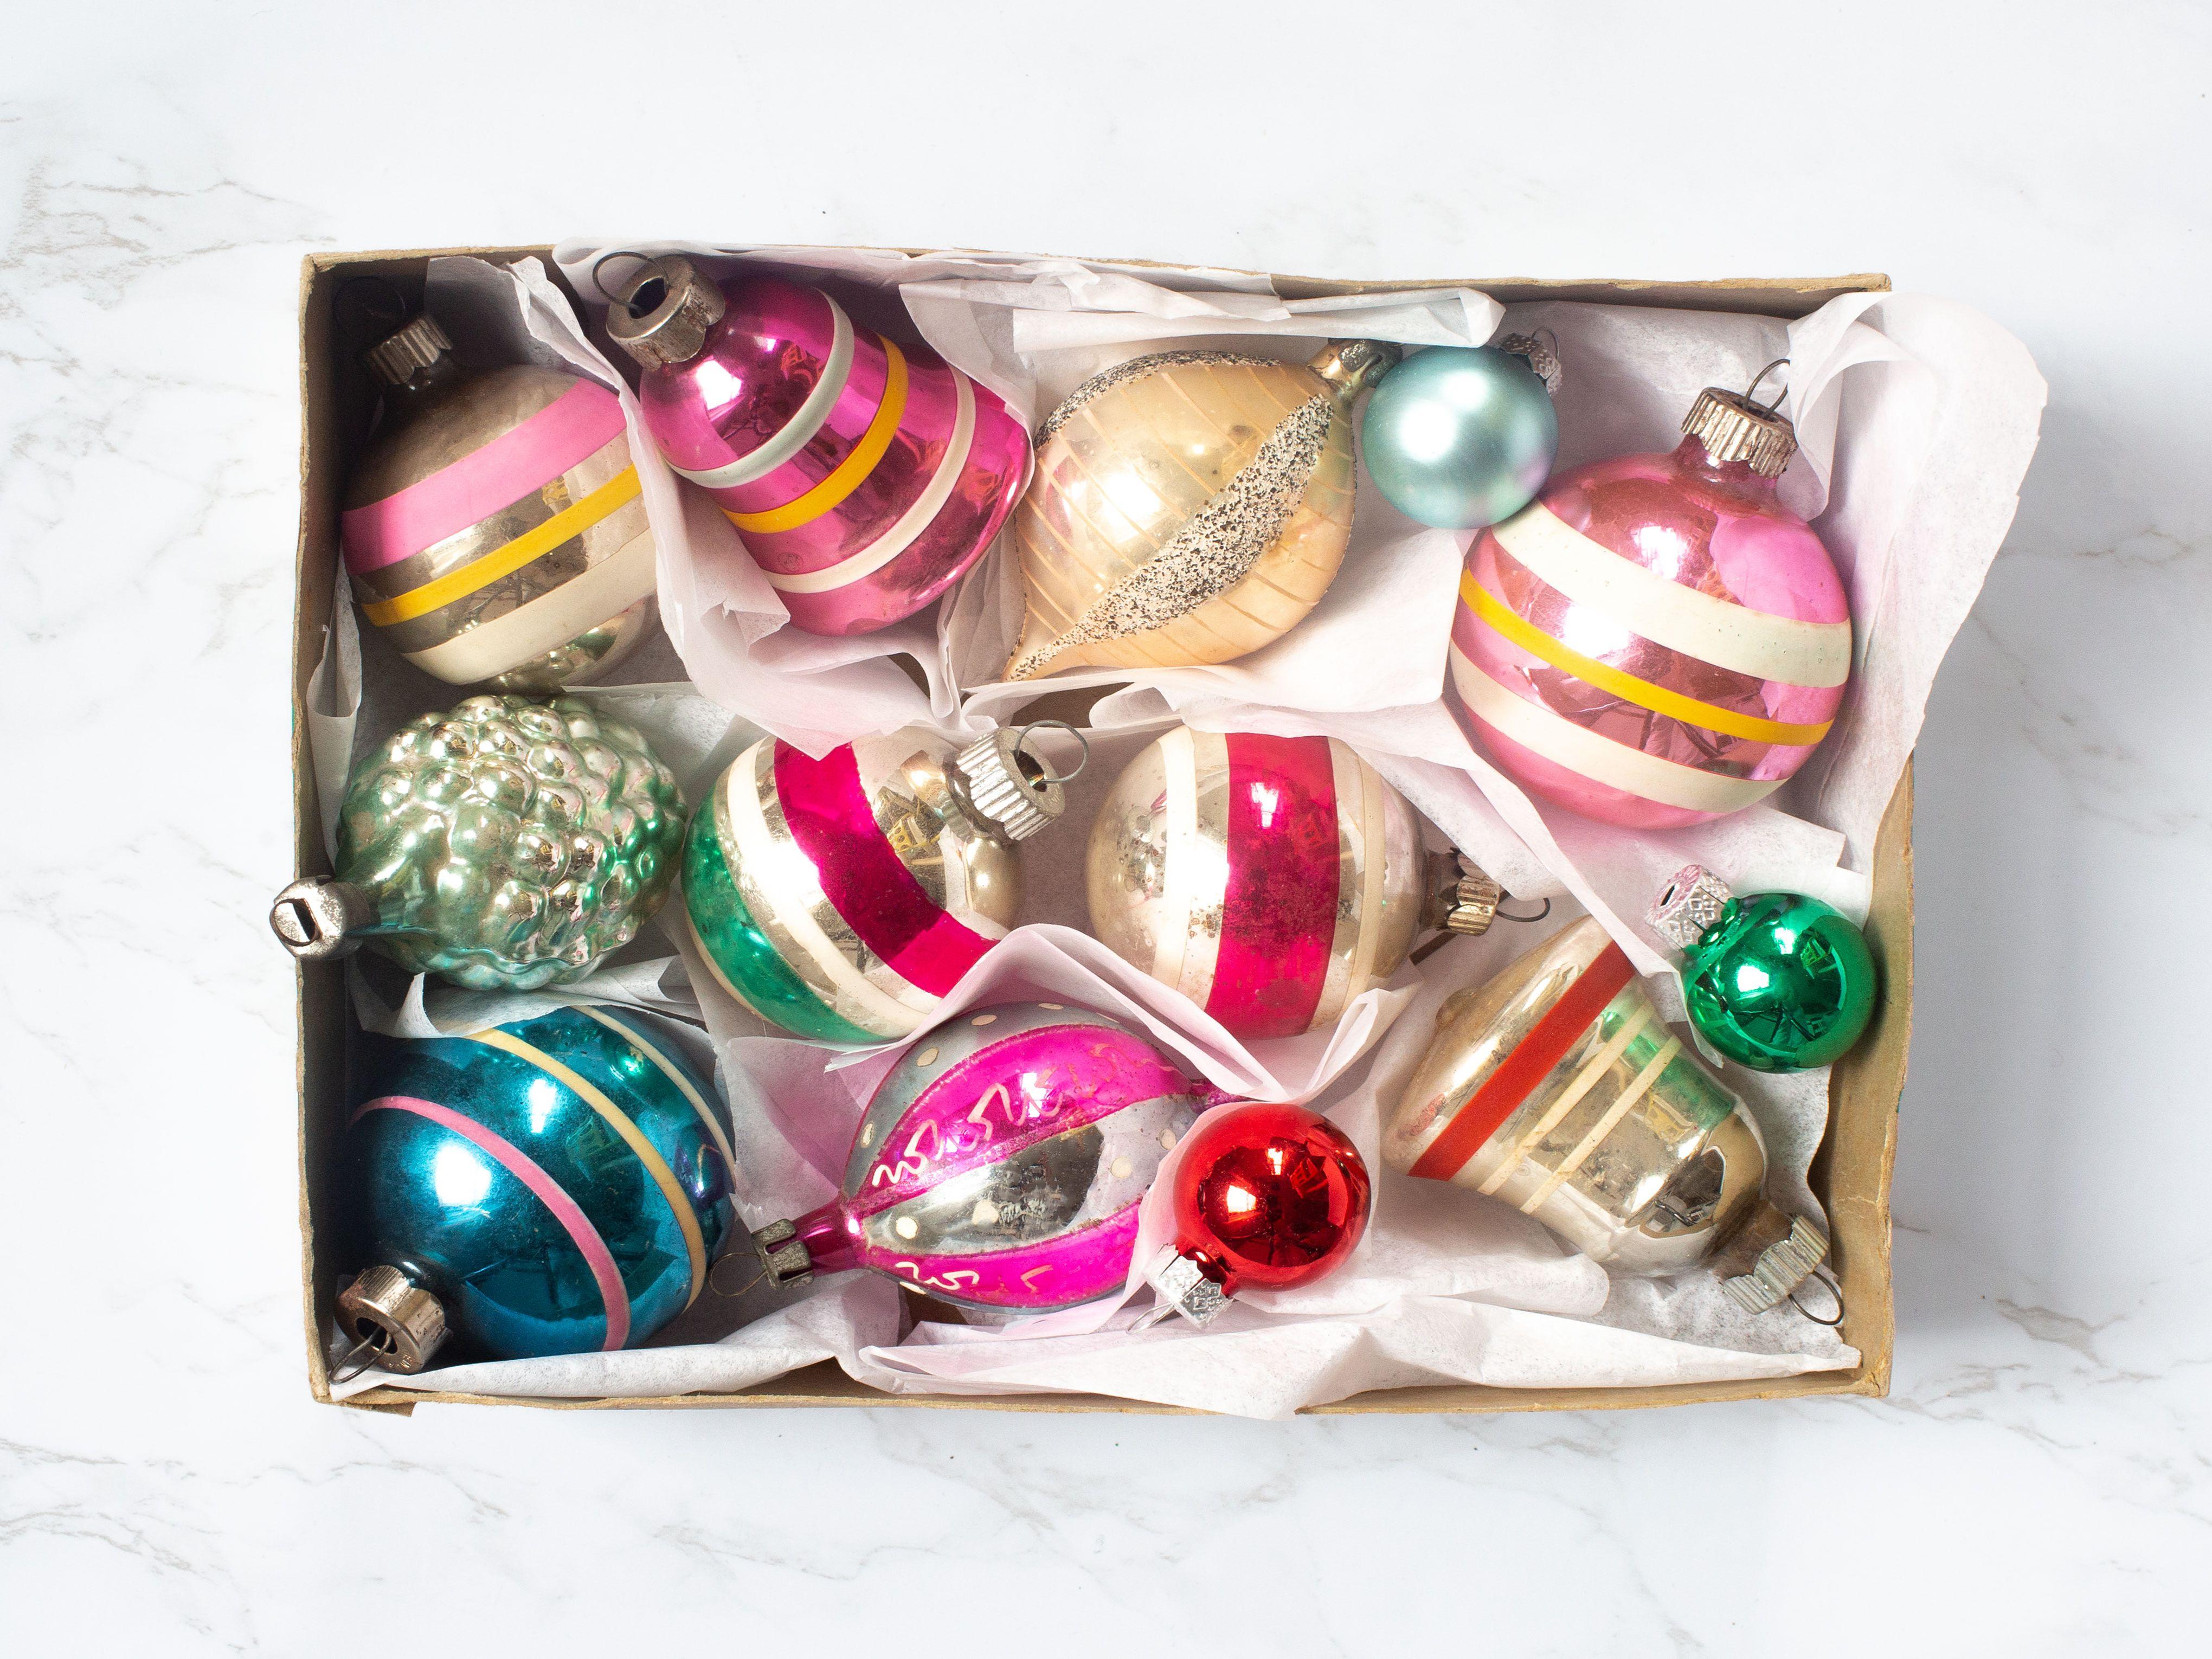 A Set of crochet Christmas ornaments 6 pcs  Christmas Decorations  Christmas Decor  Christmas tree decor  winter holiday decorations